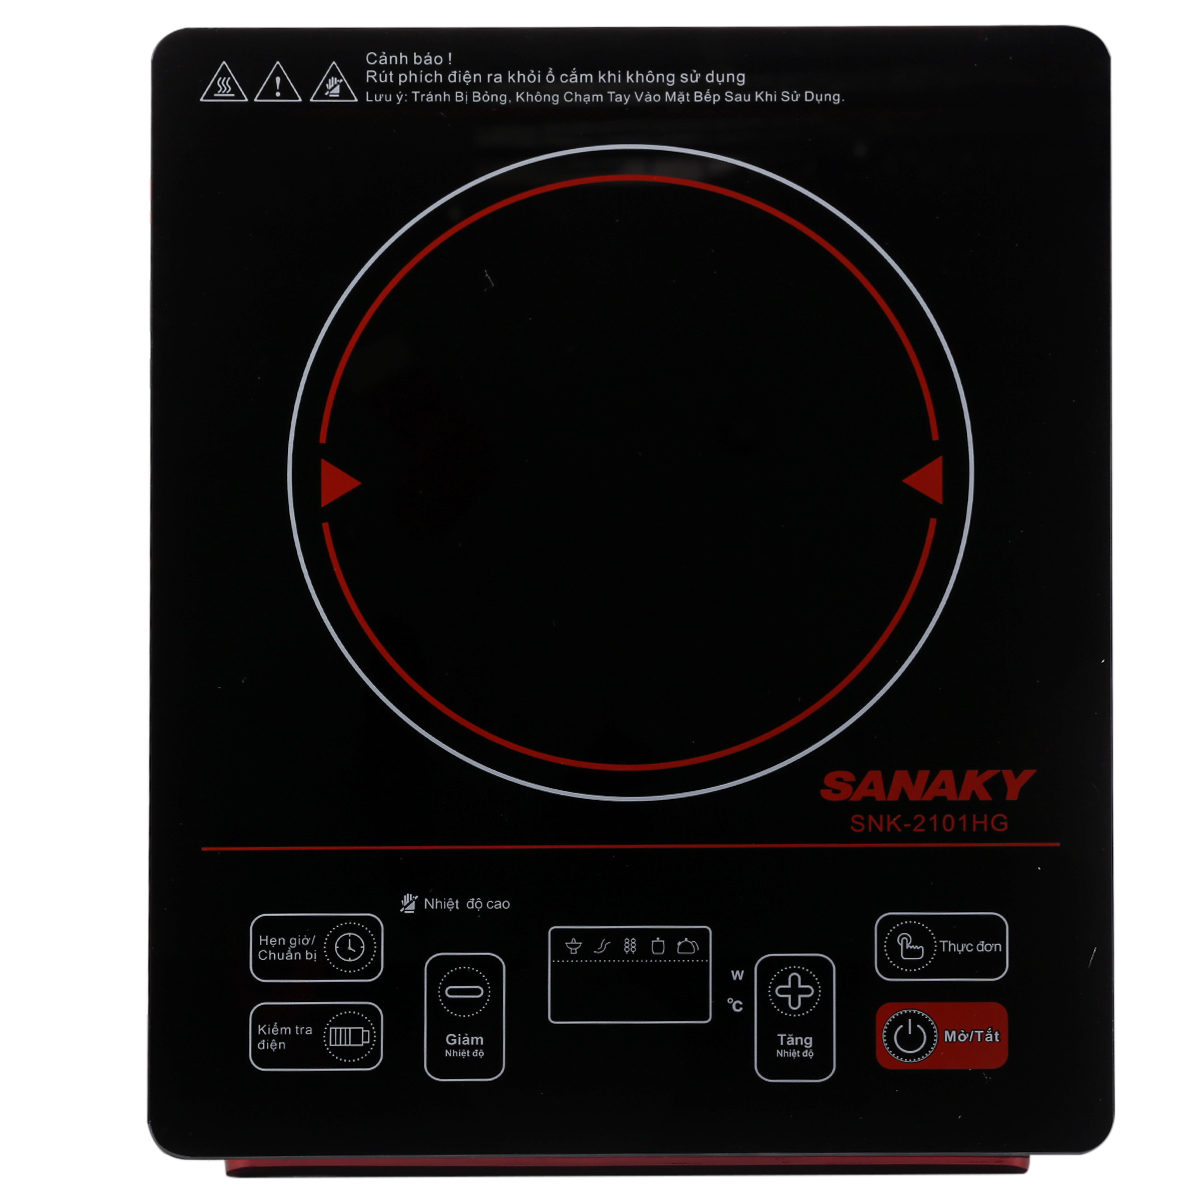 Bếp hồng ngoại Sanaky SNK-2101HG